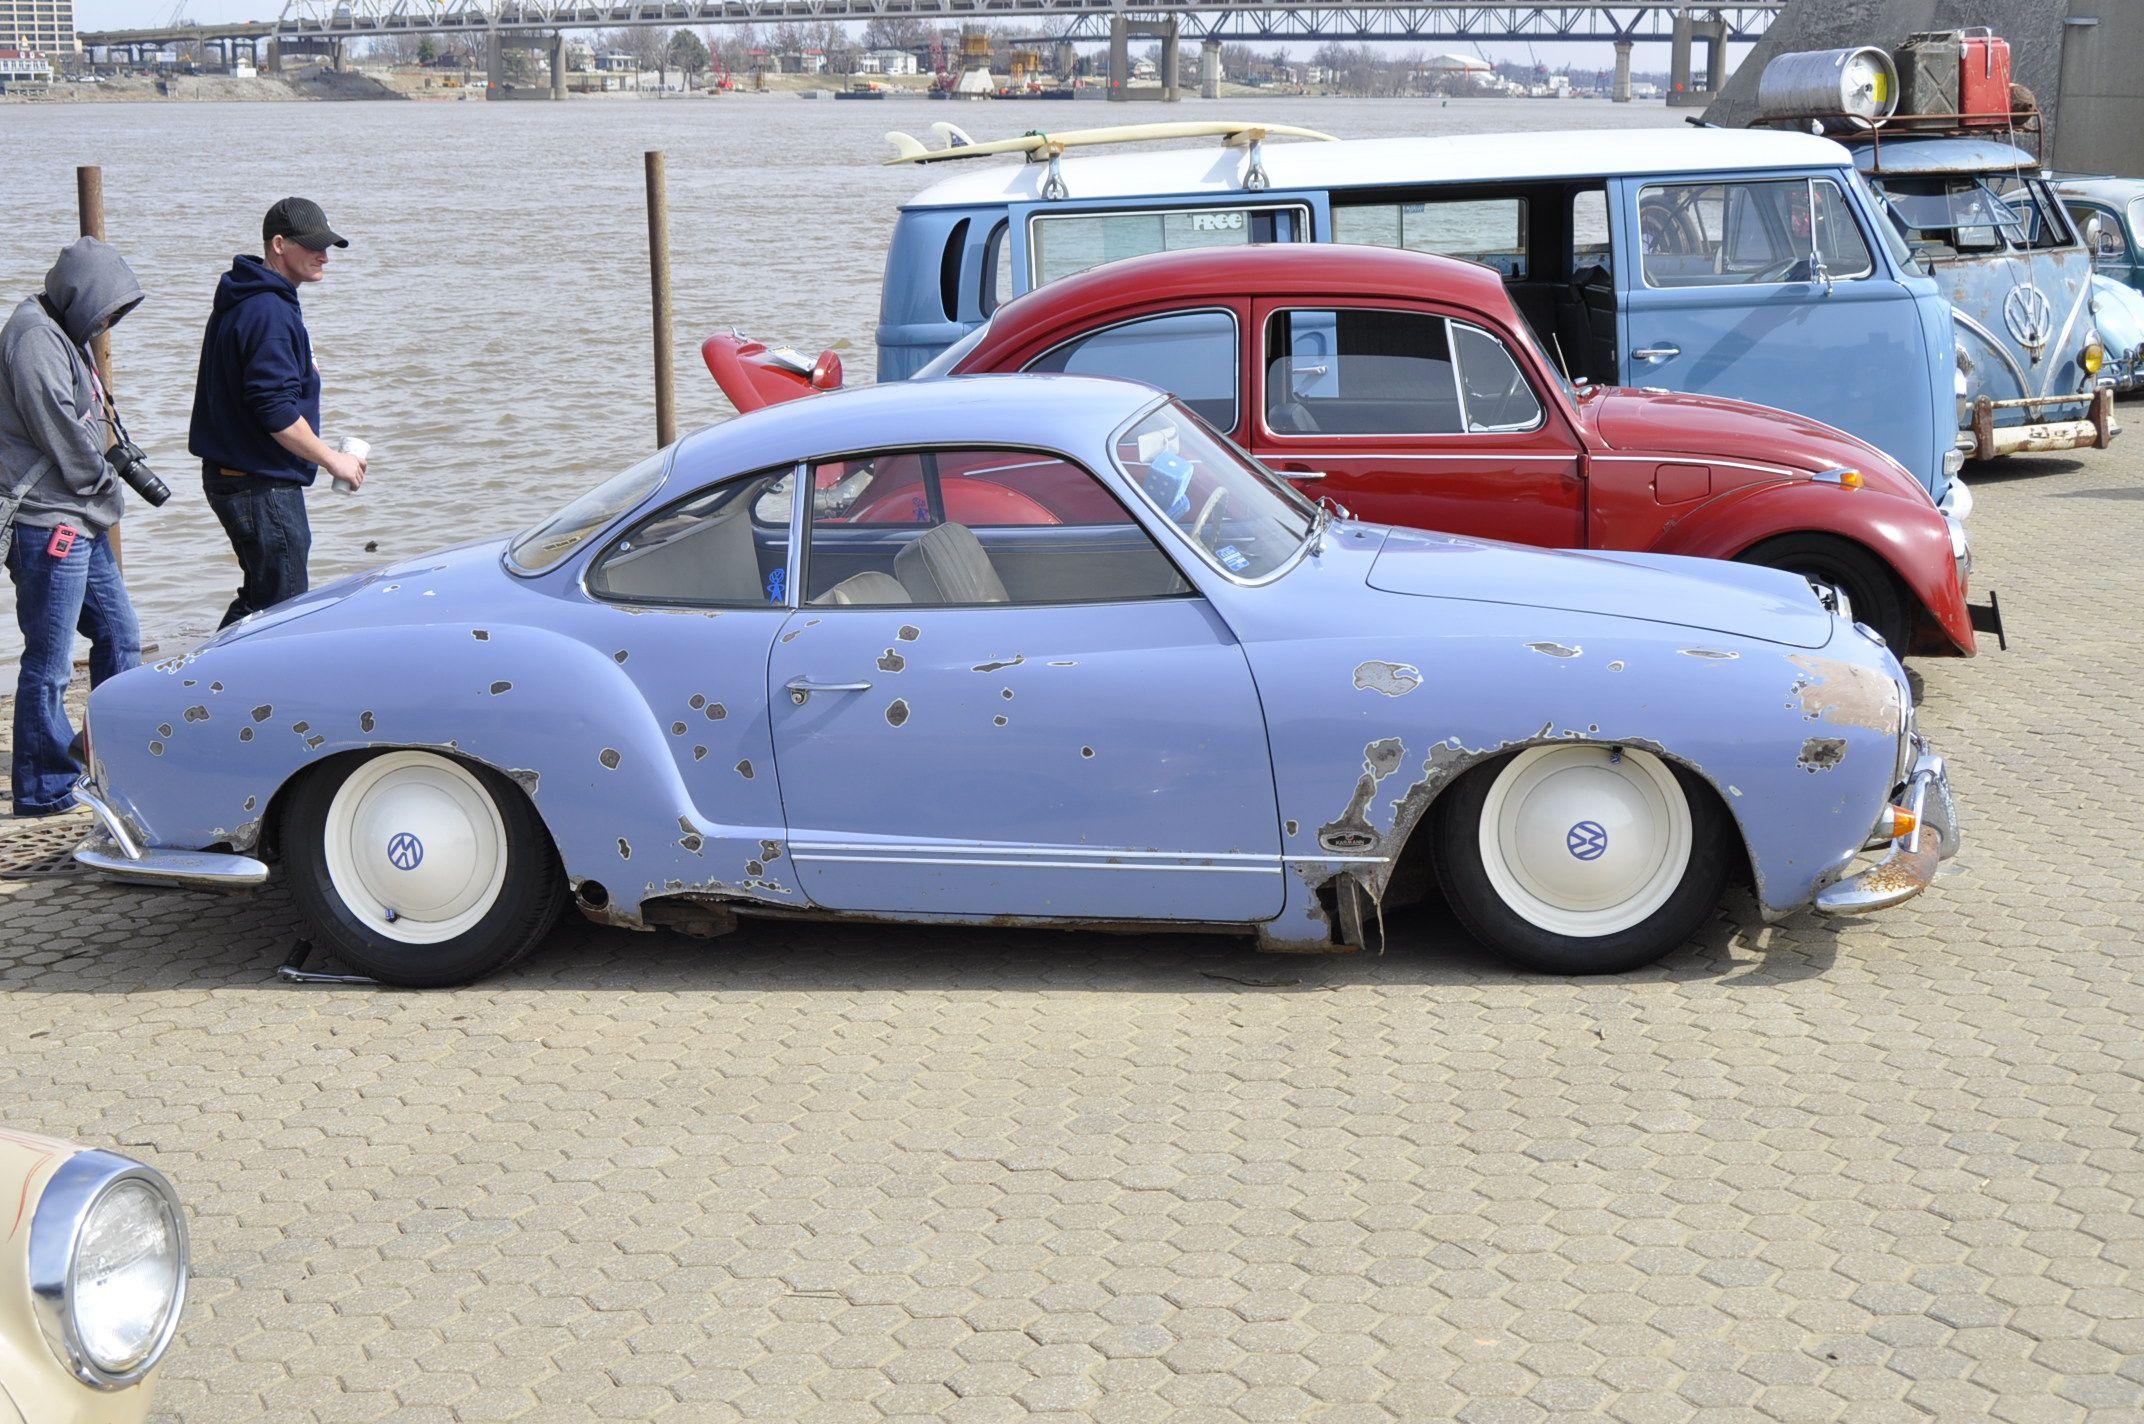 view copart louisville online title en carfinder ky left cert of auctions tur volkswagen in lot beetle black adbe auto salvage sale on